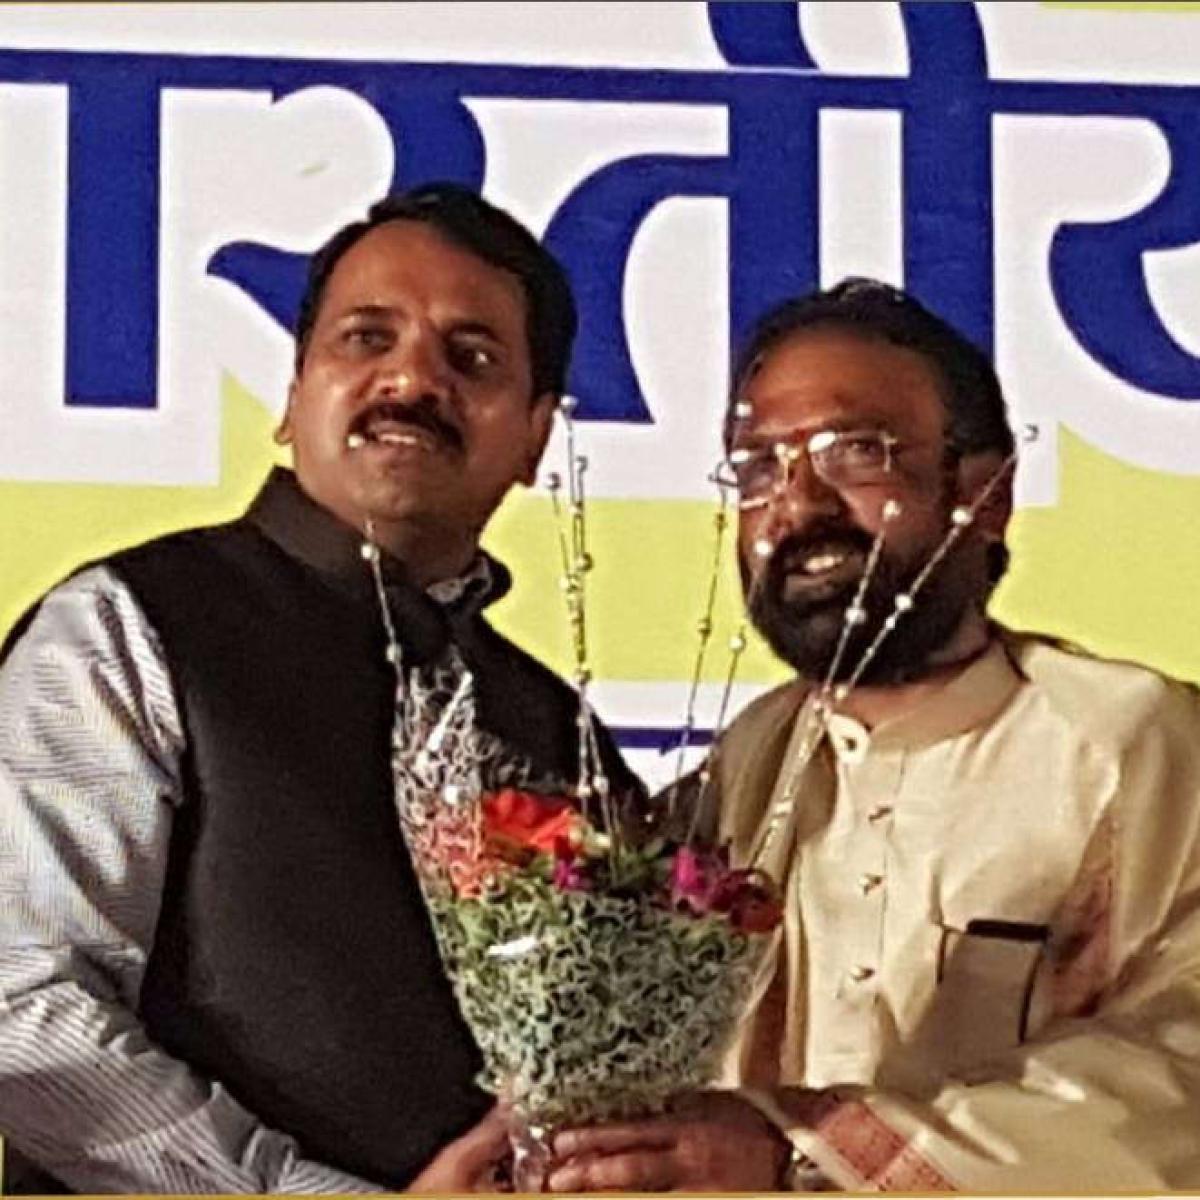 Mira Bhayandar: Viral audio clip exposes widening rift in BJP